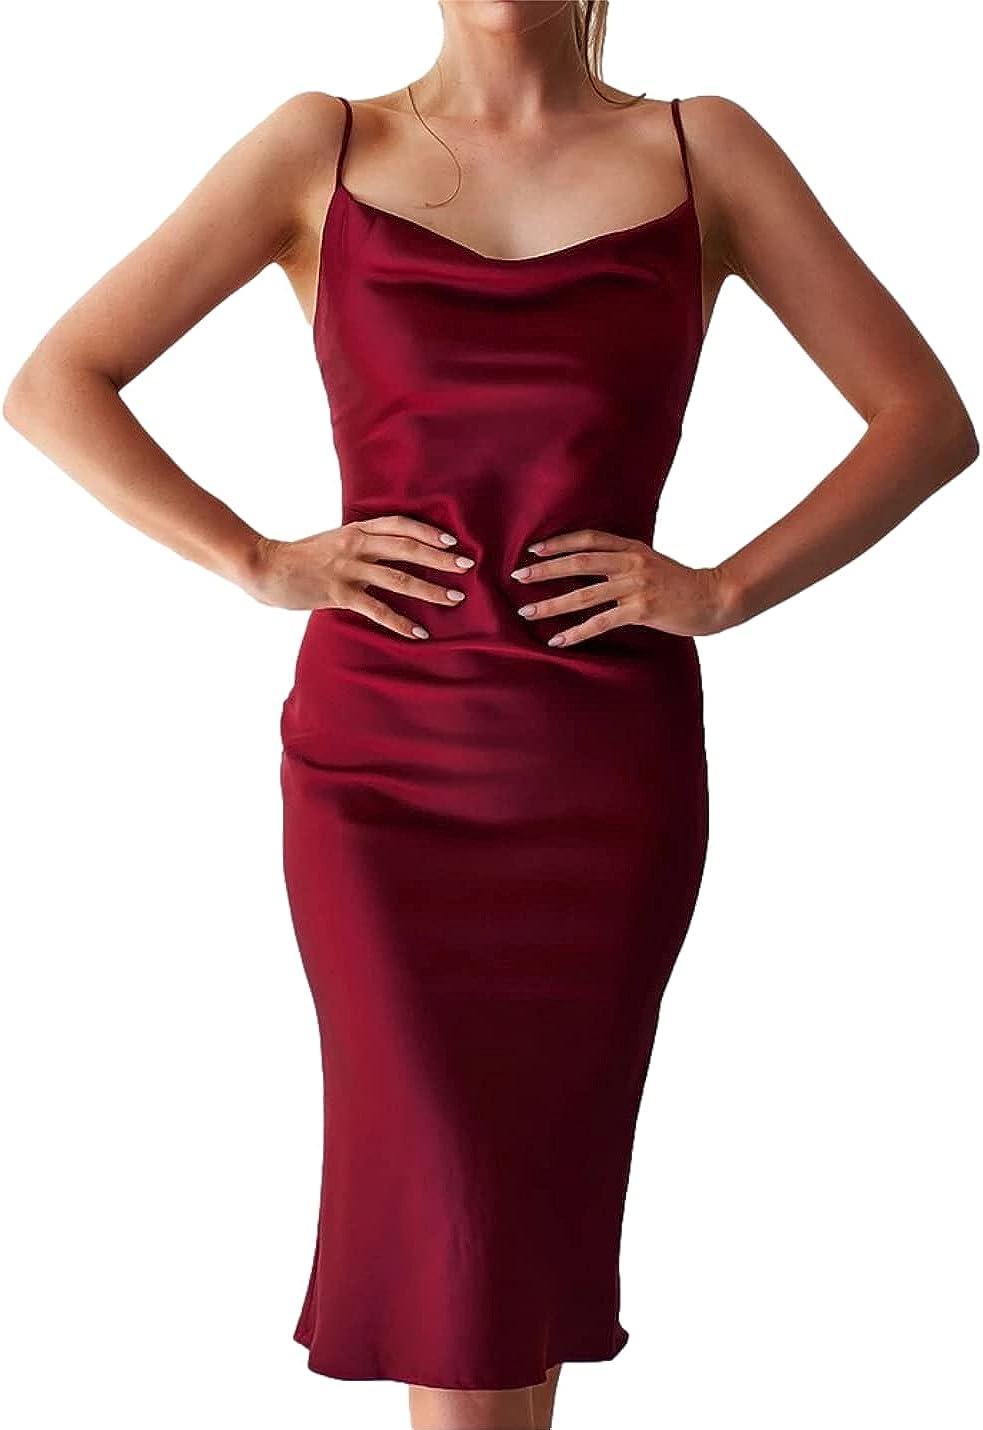 Bnigung Women's Sexy Satin Dress Sleeveless Spaghetti Strap Cocktail Evening Party Bodycon Midi Dresses